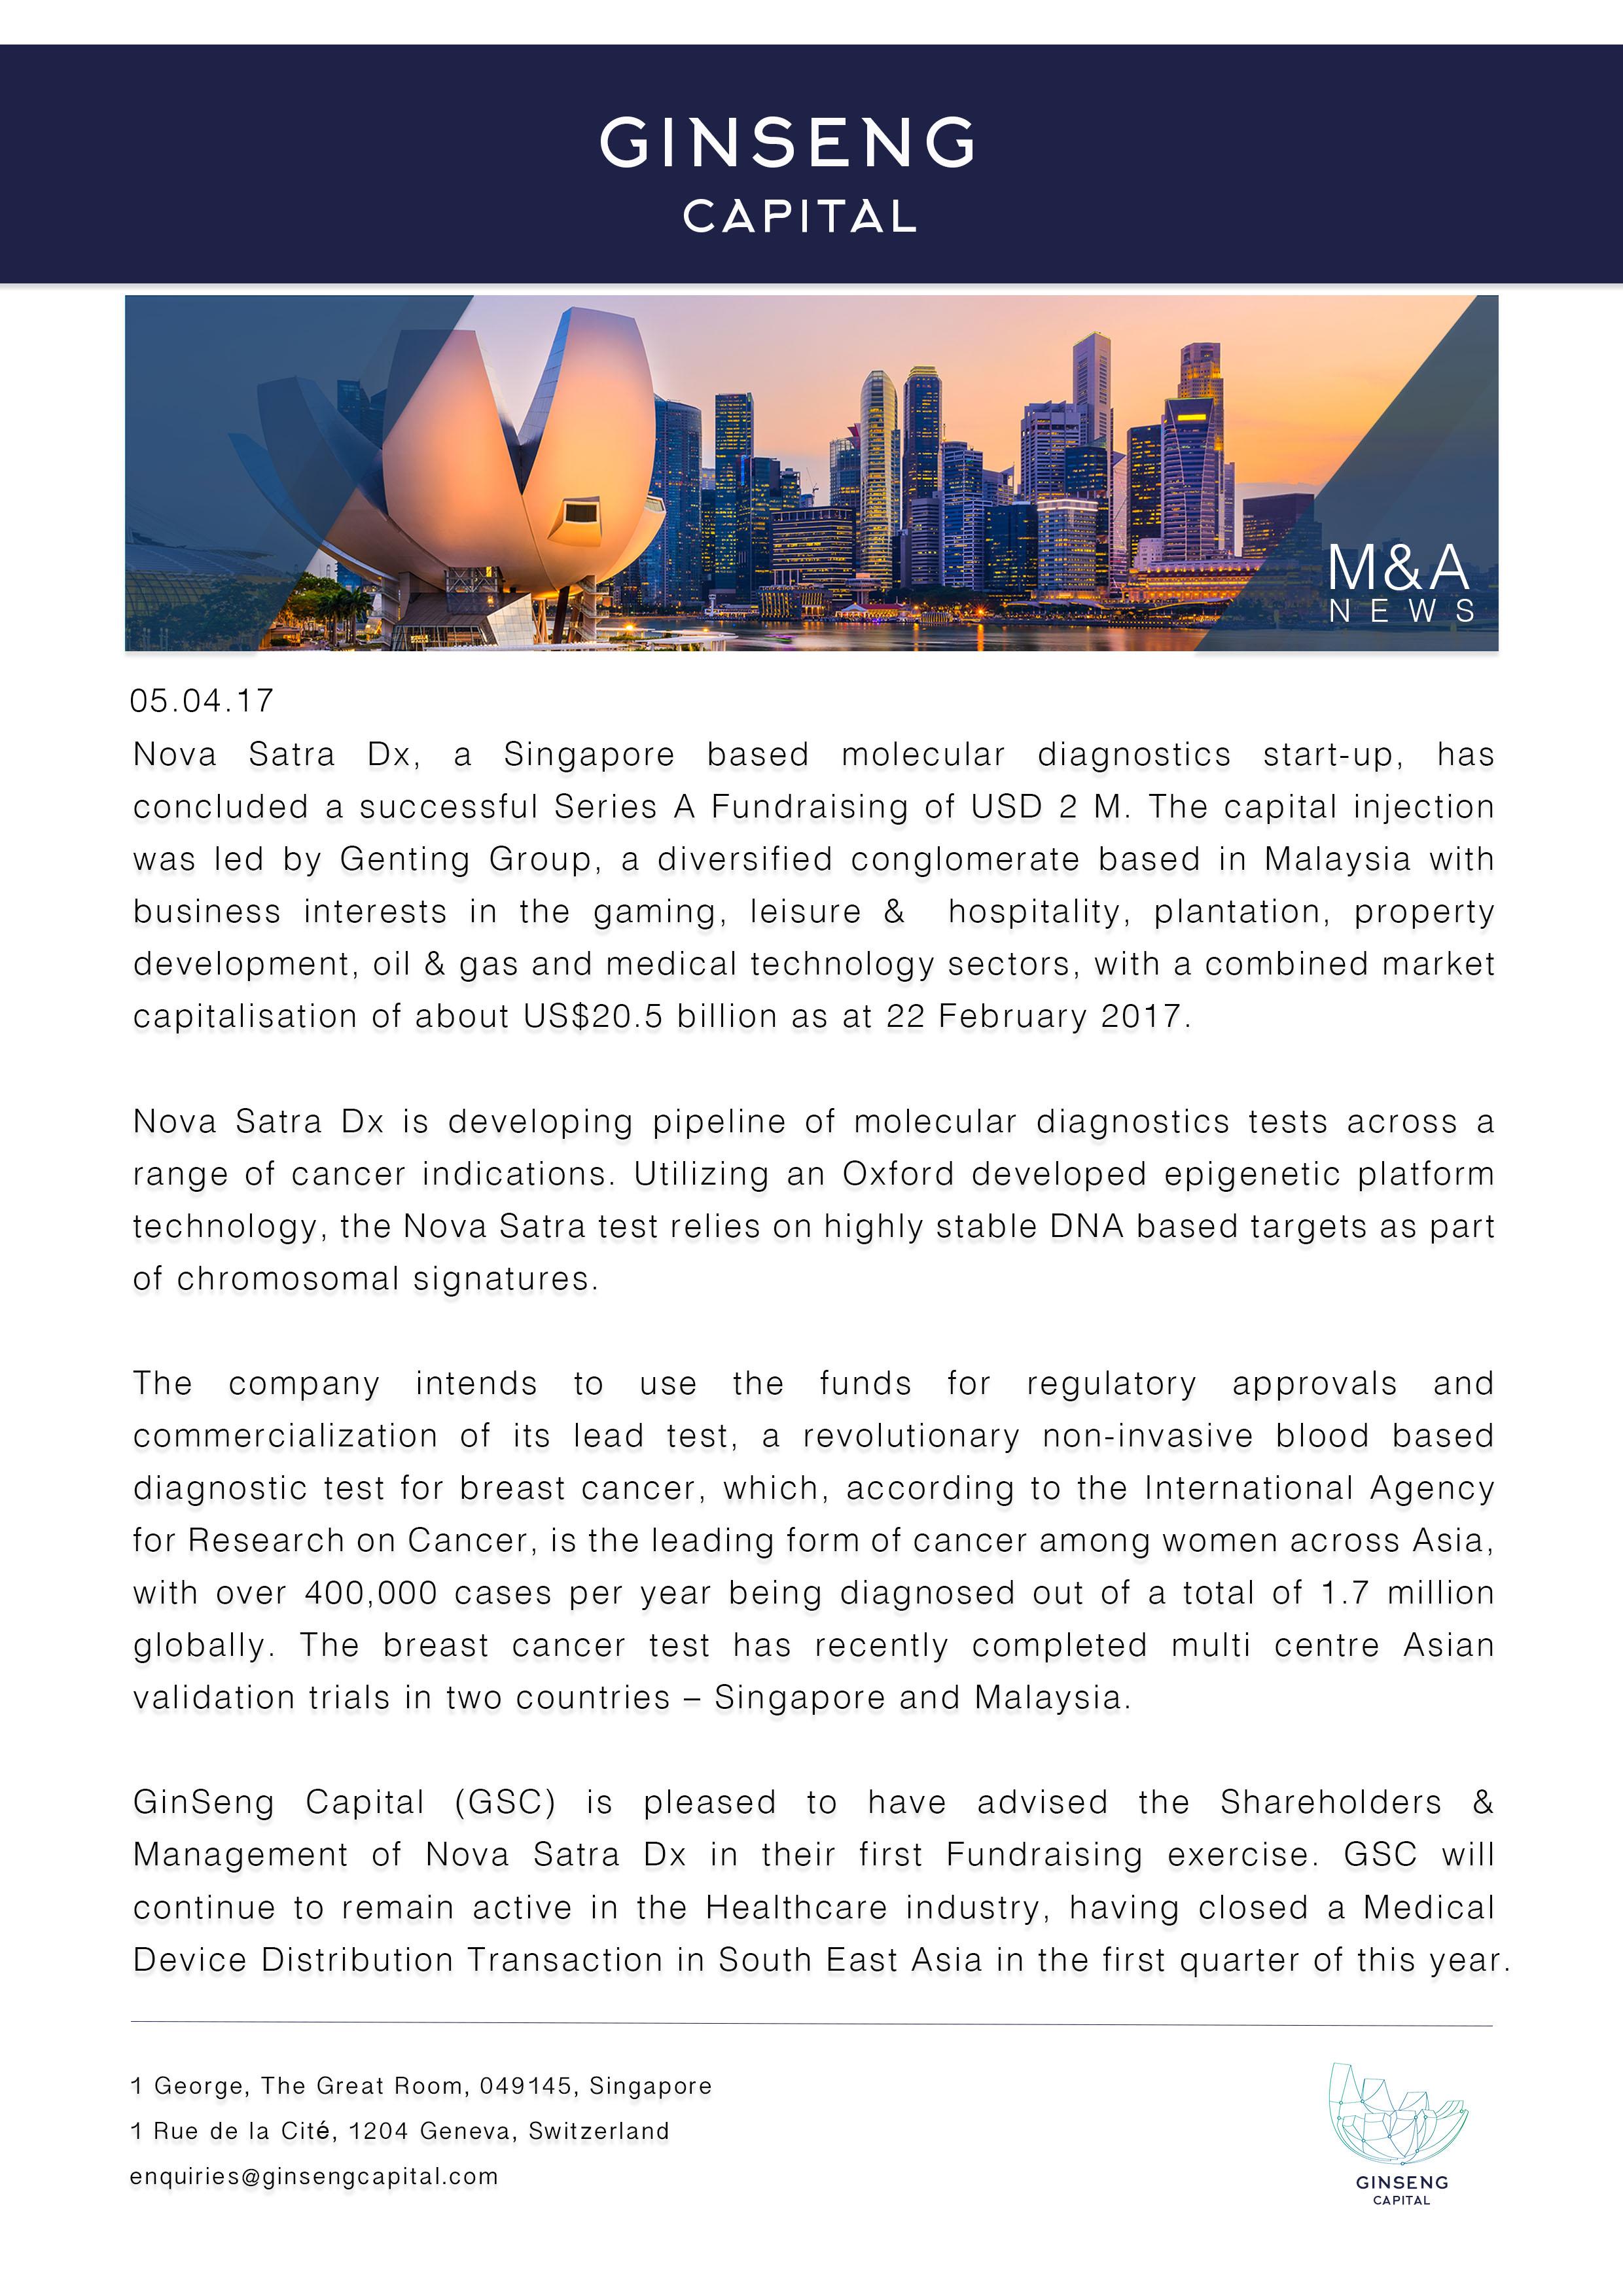 Nova Satra | Ginseng Capital 2017